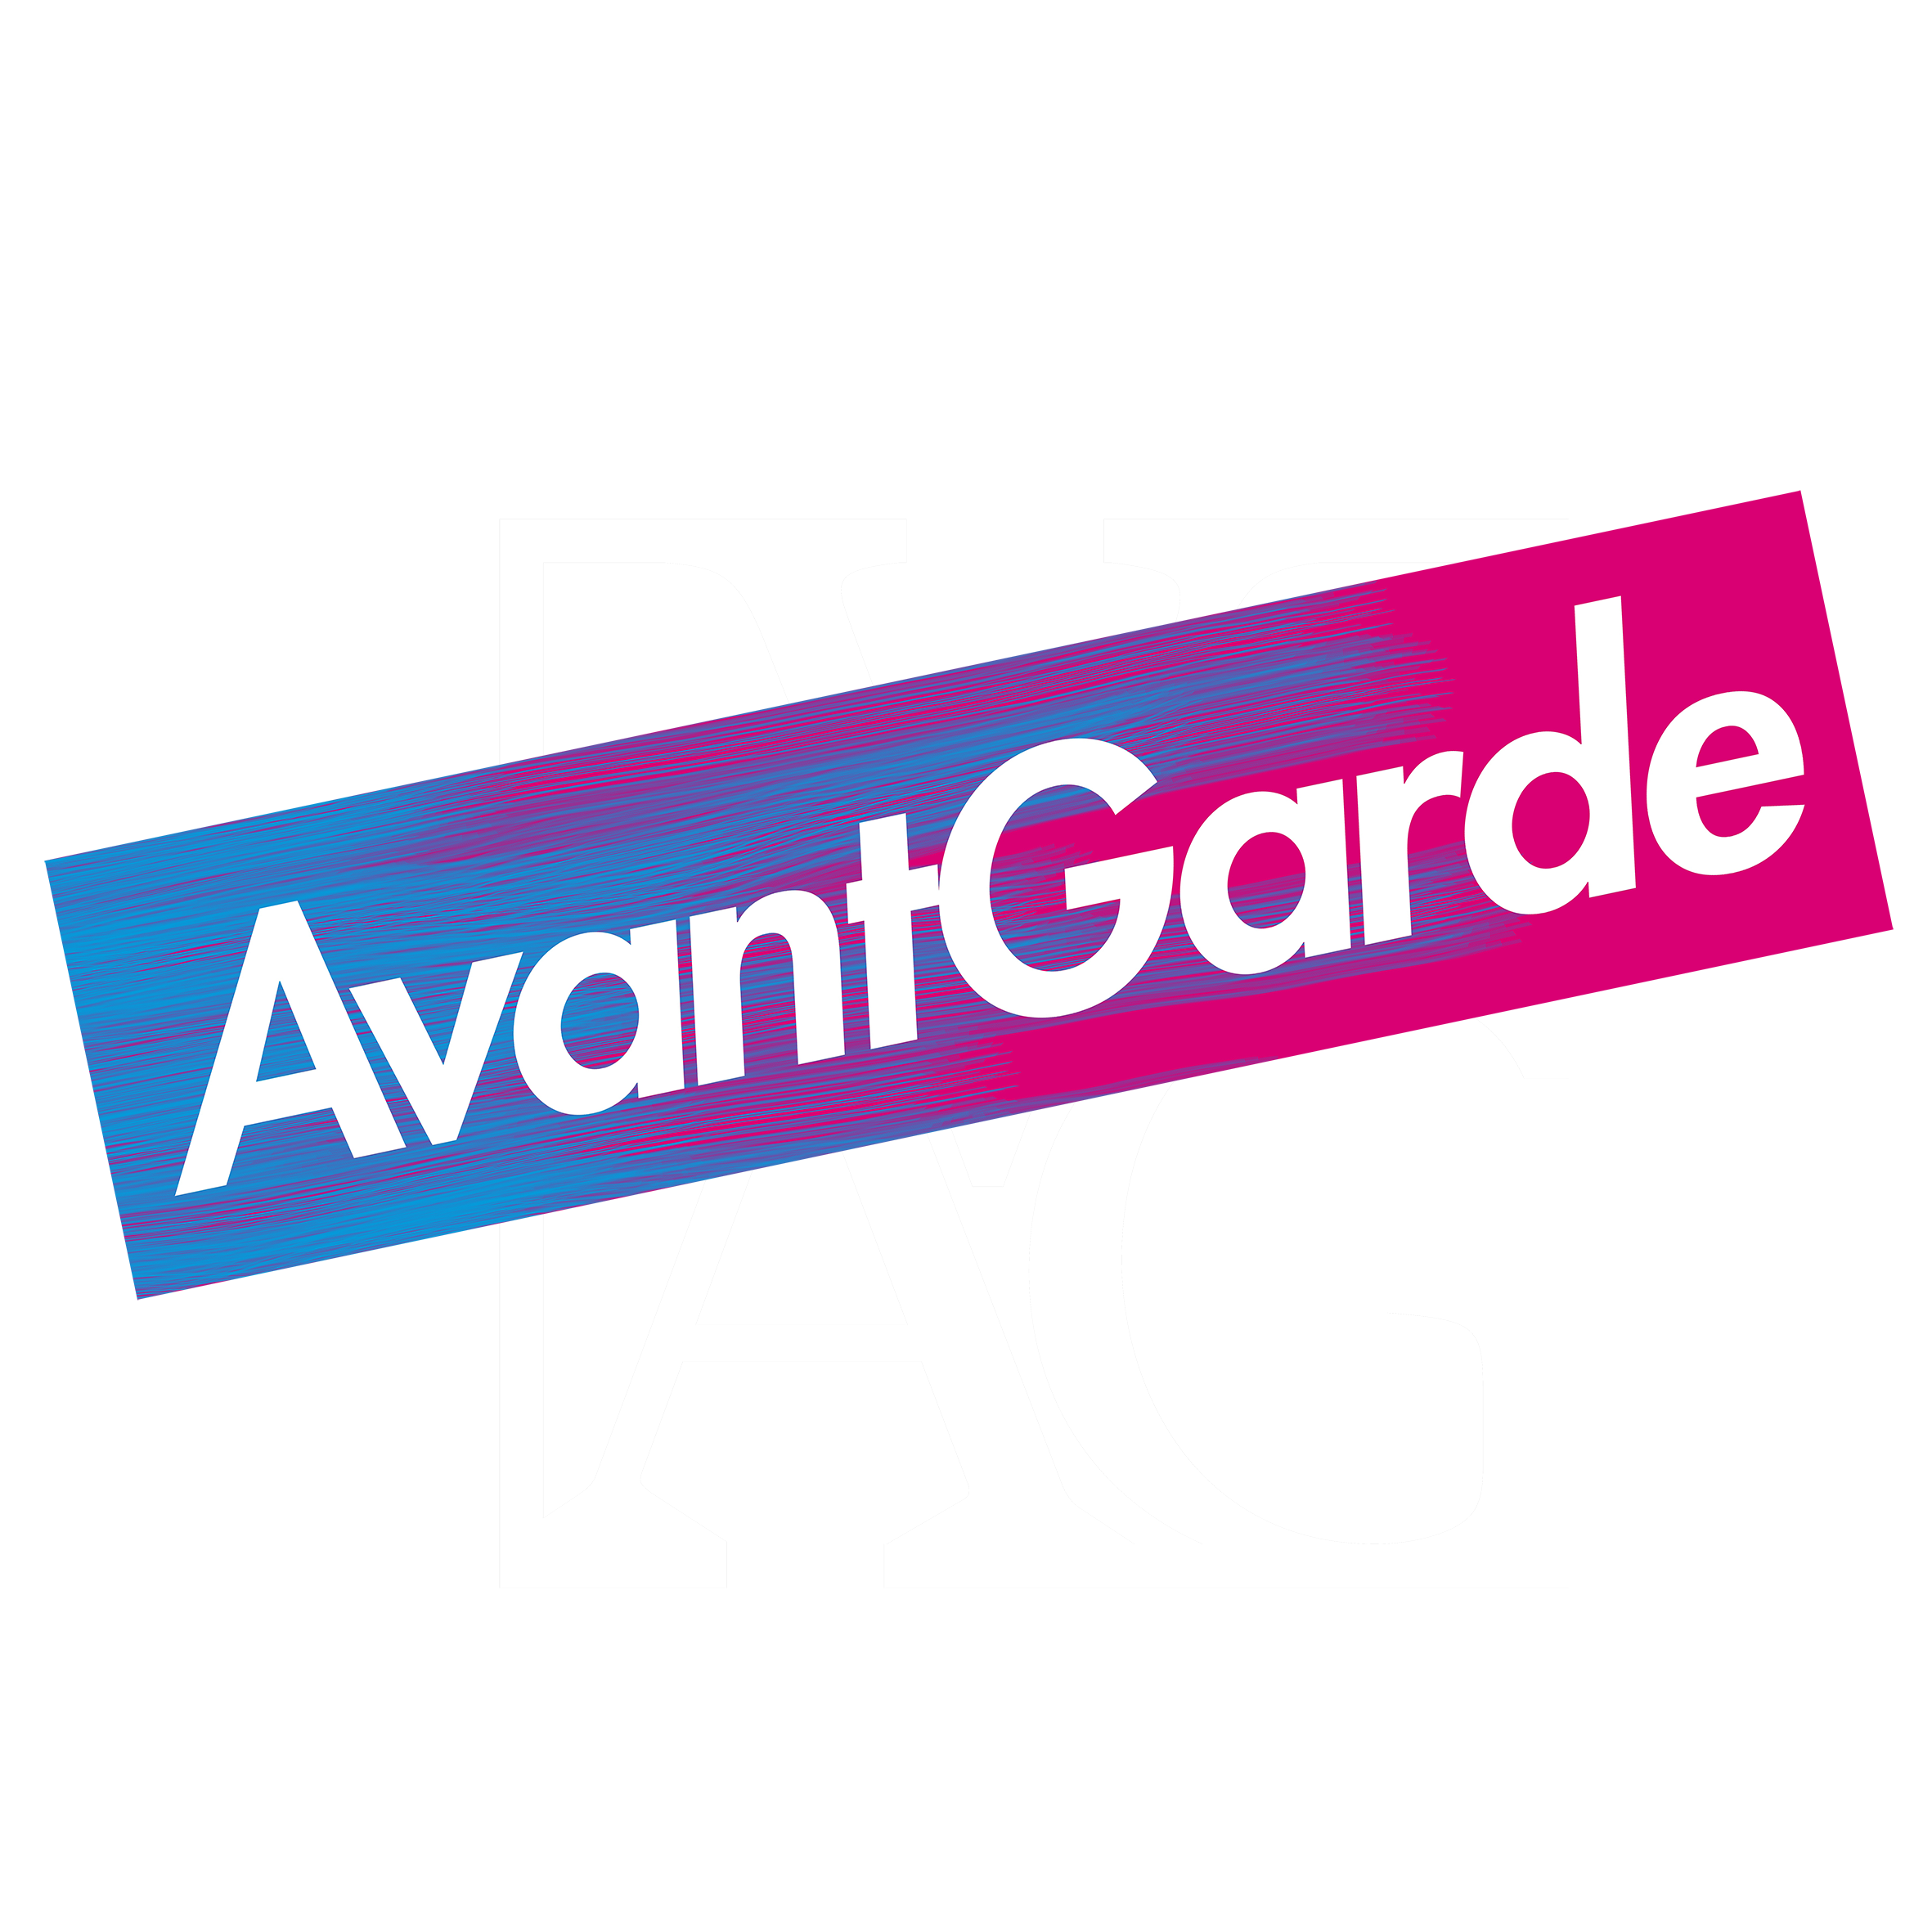 AVG_LOGO_fasnacht2019.png